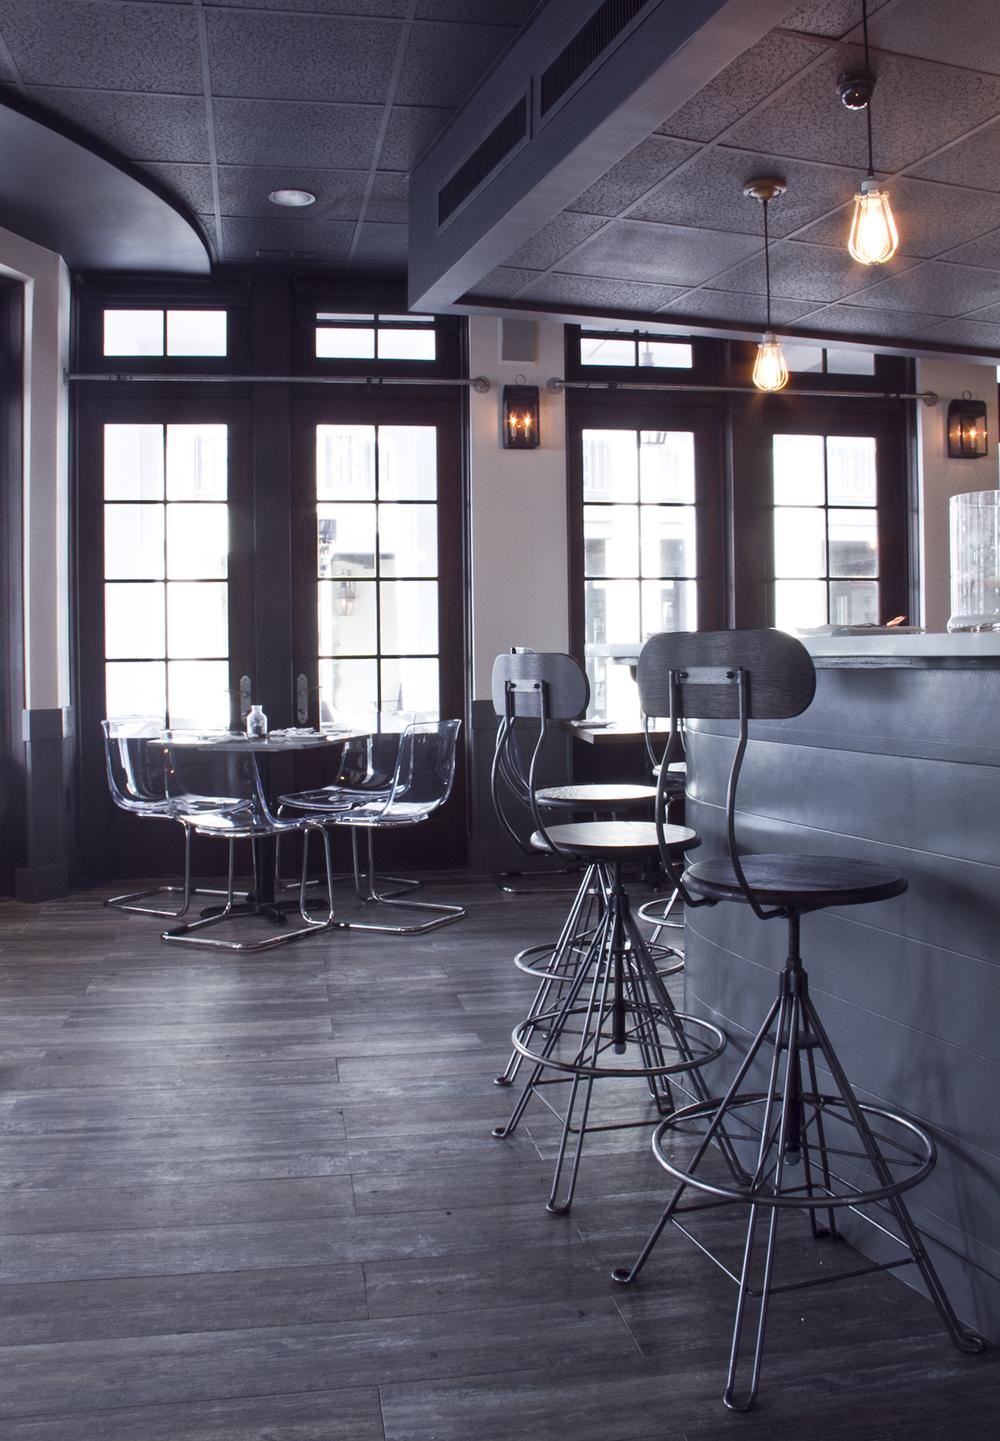 aqua-stools and chairs.jpg